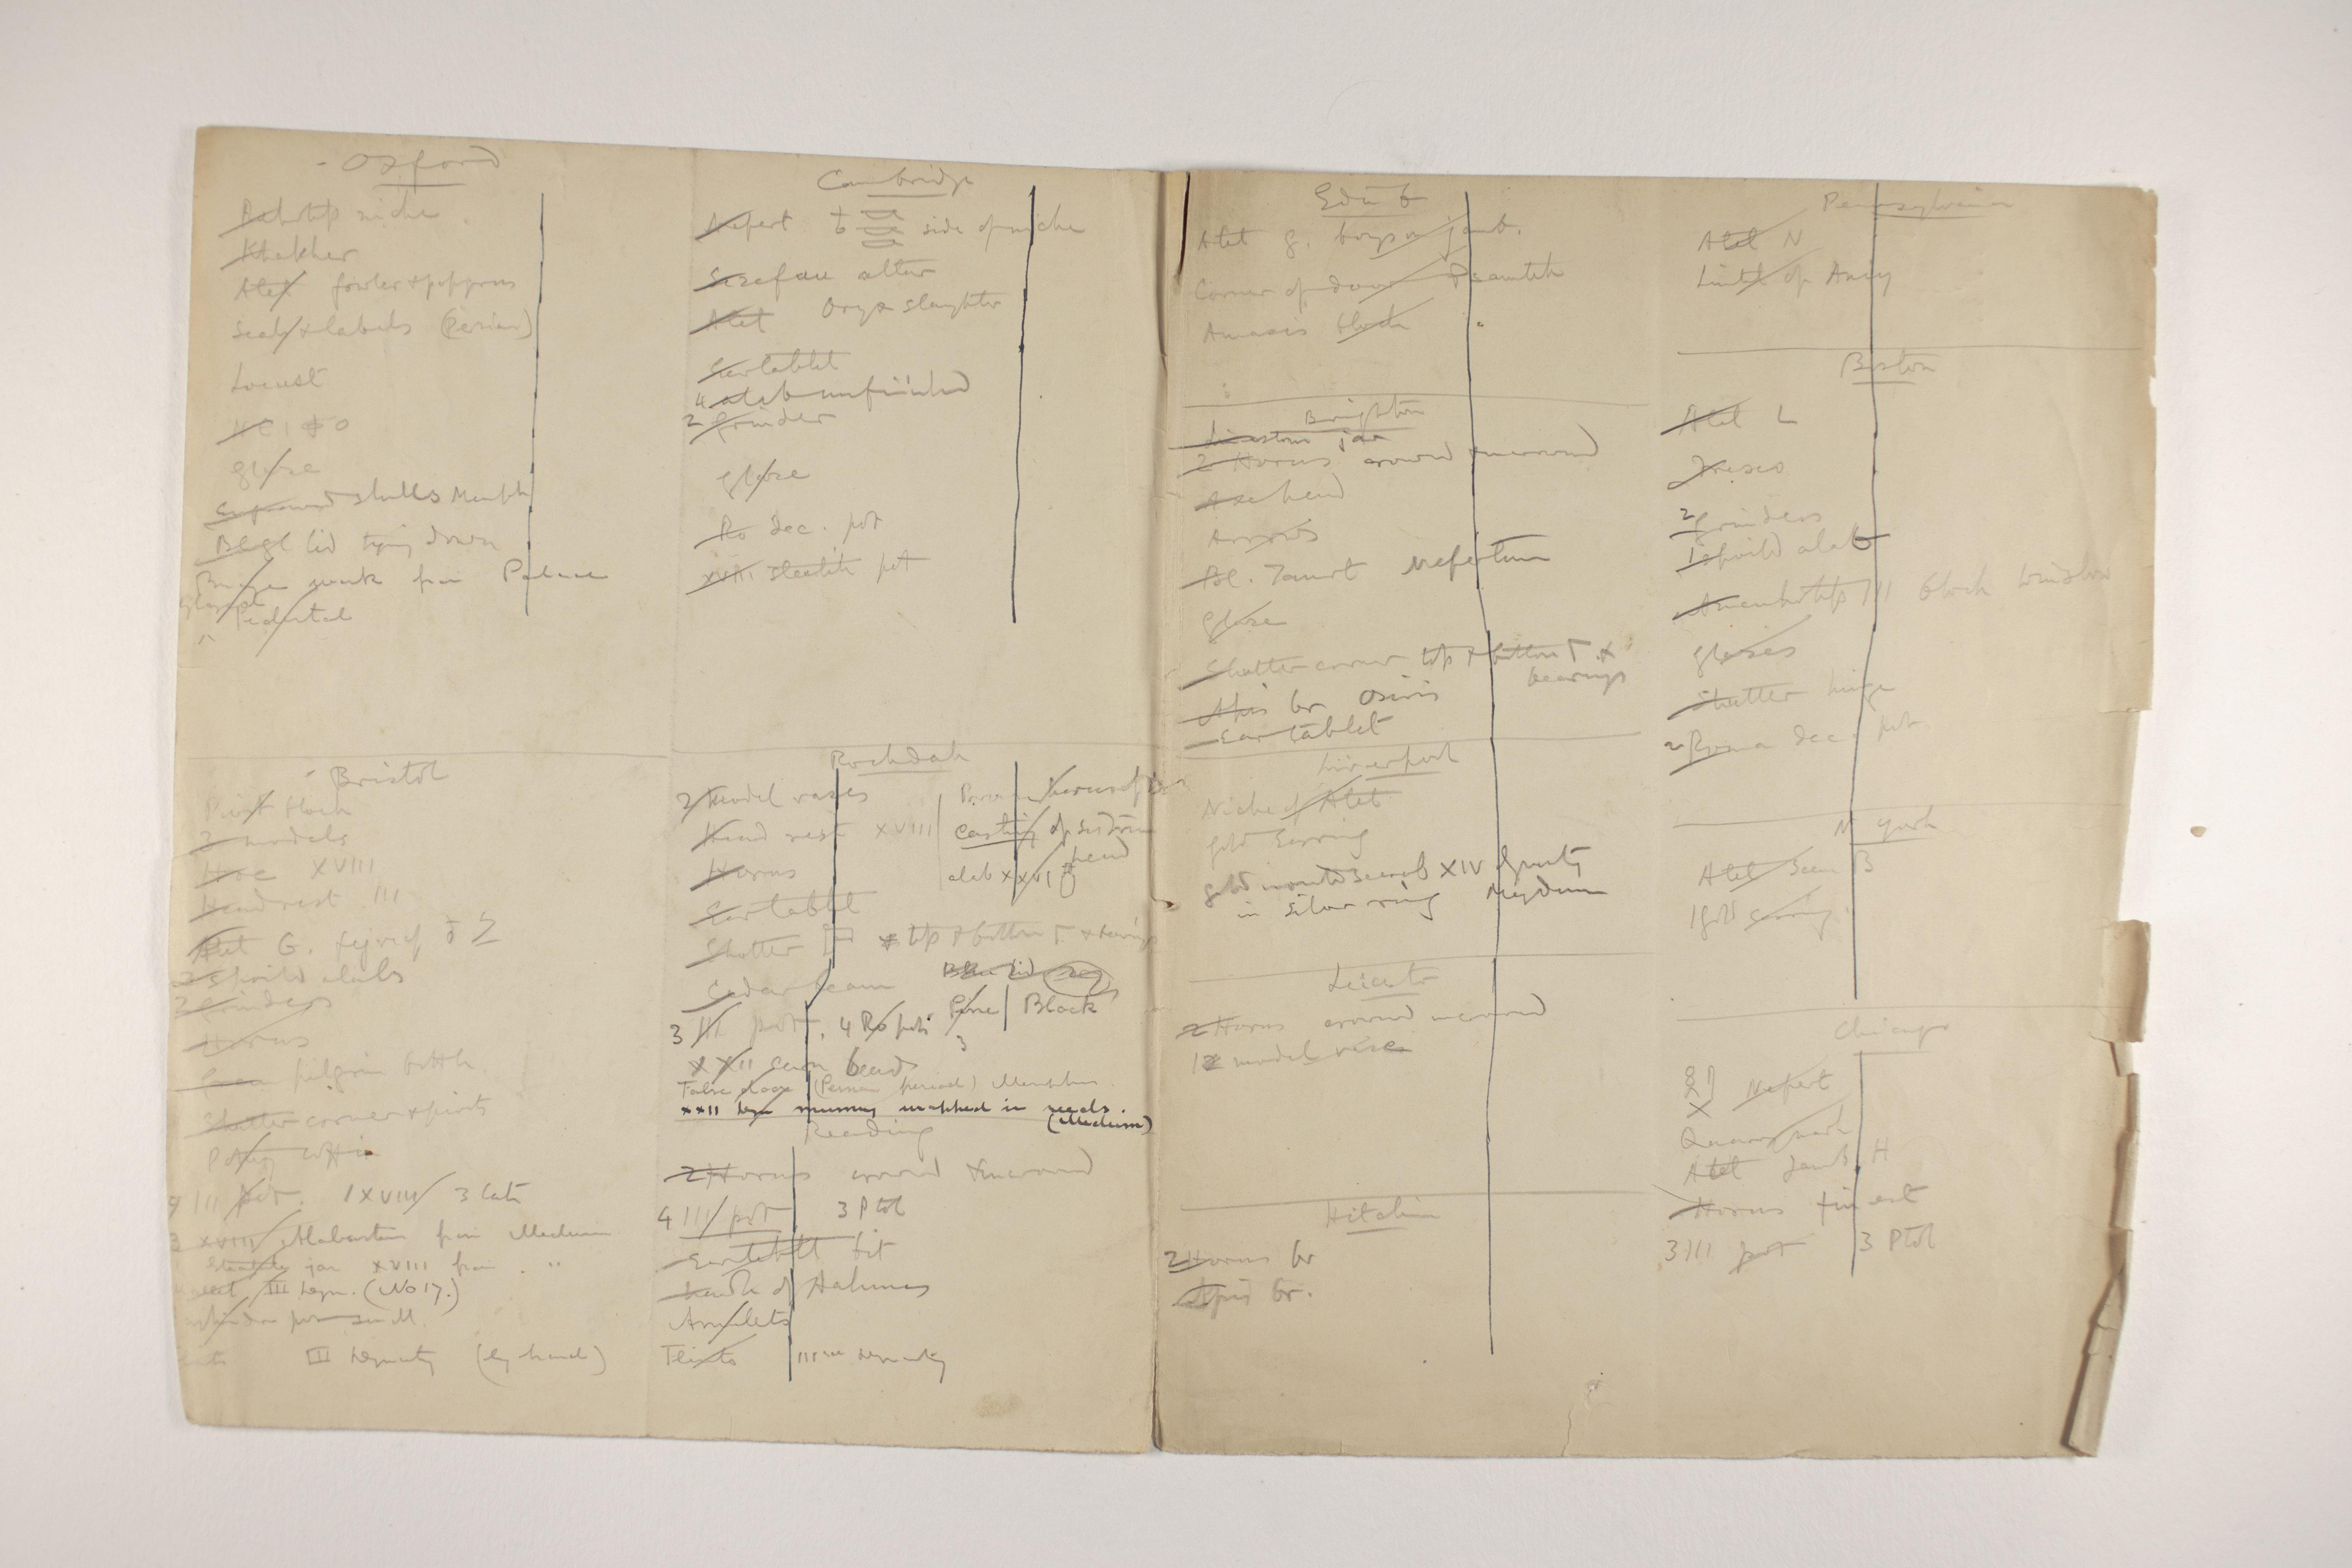 1909-10 Meidum, Memphis Multiple institution list PMA/WFP1/D/18/7